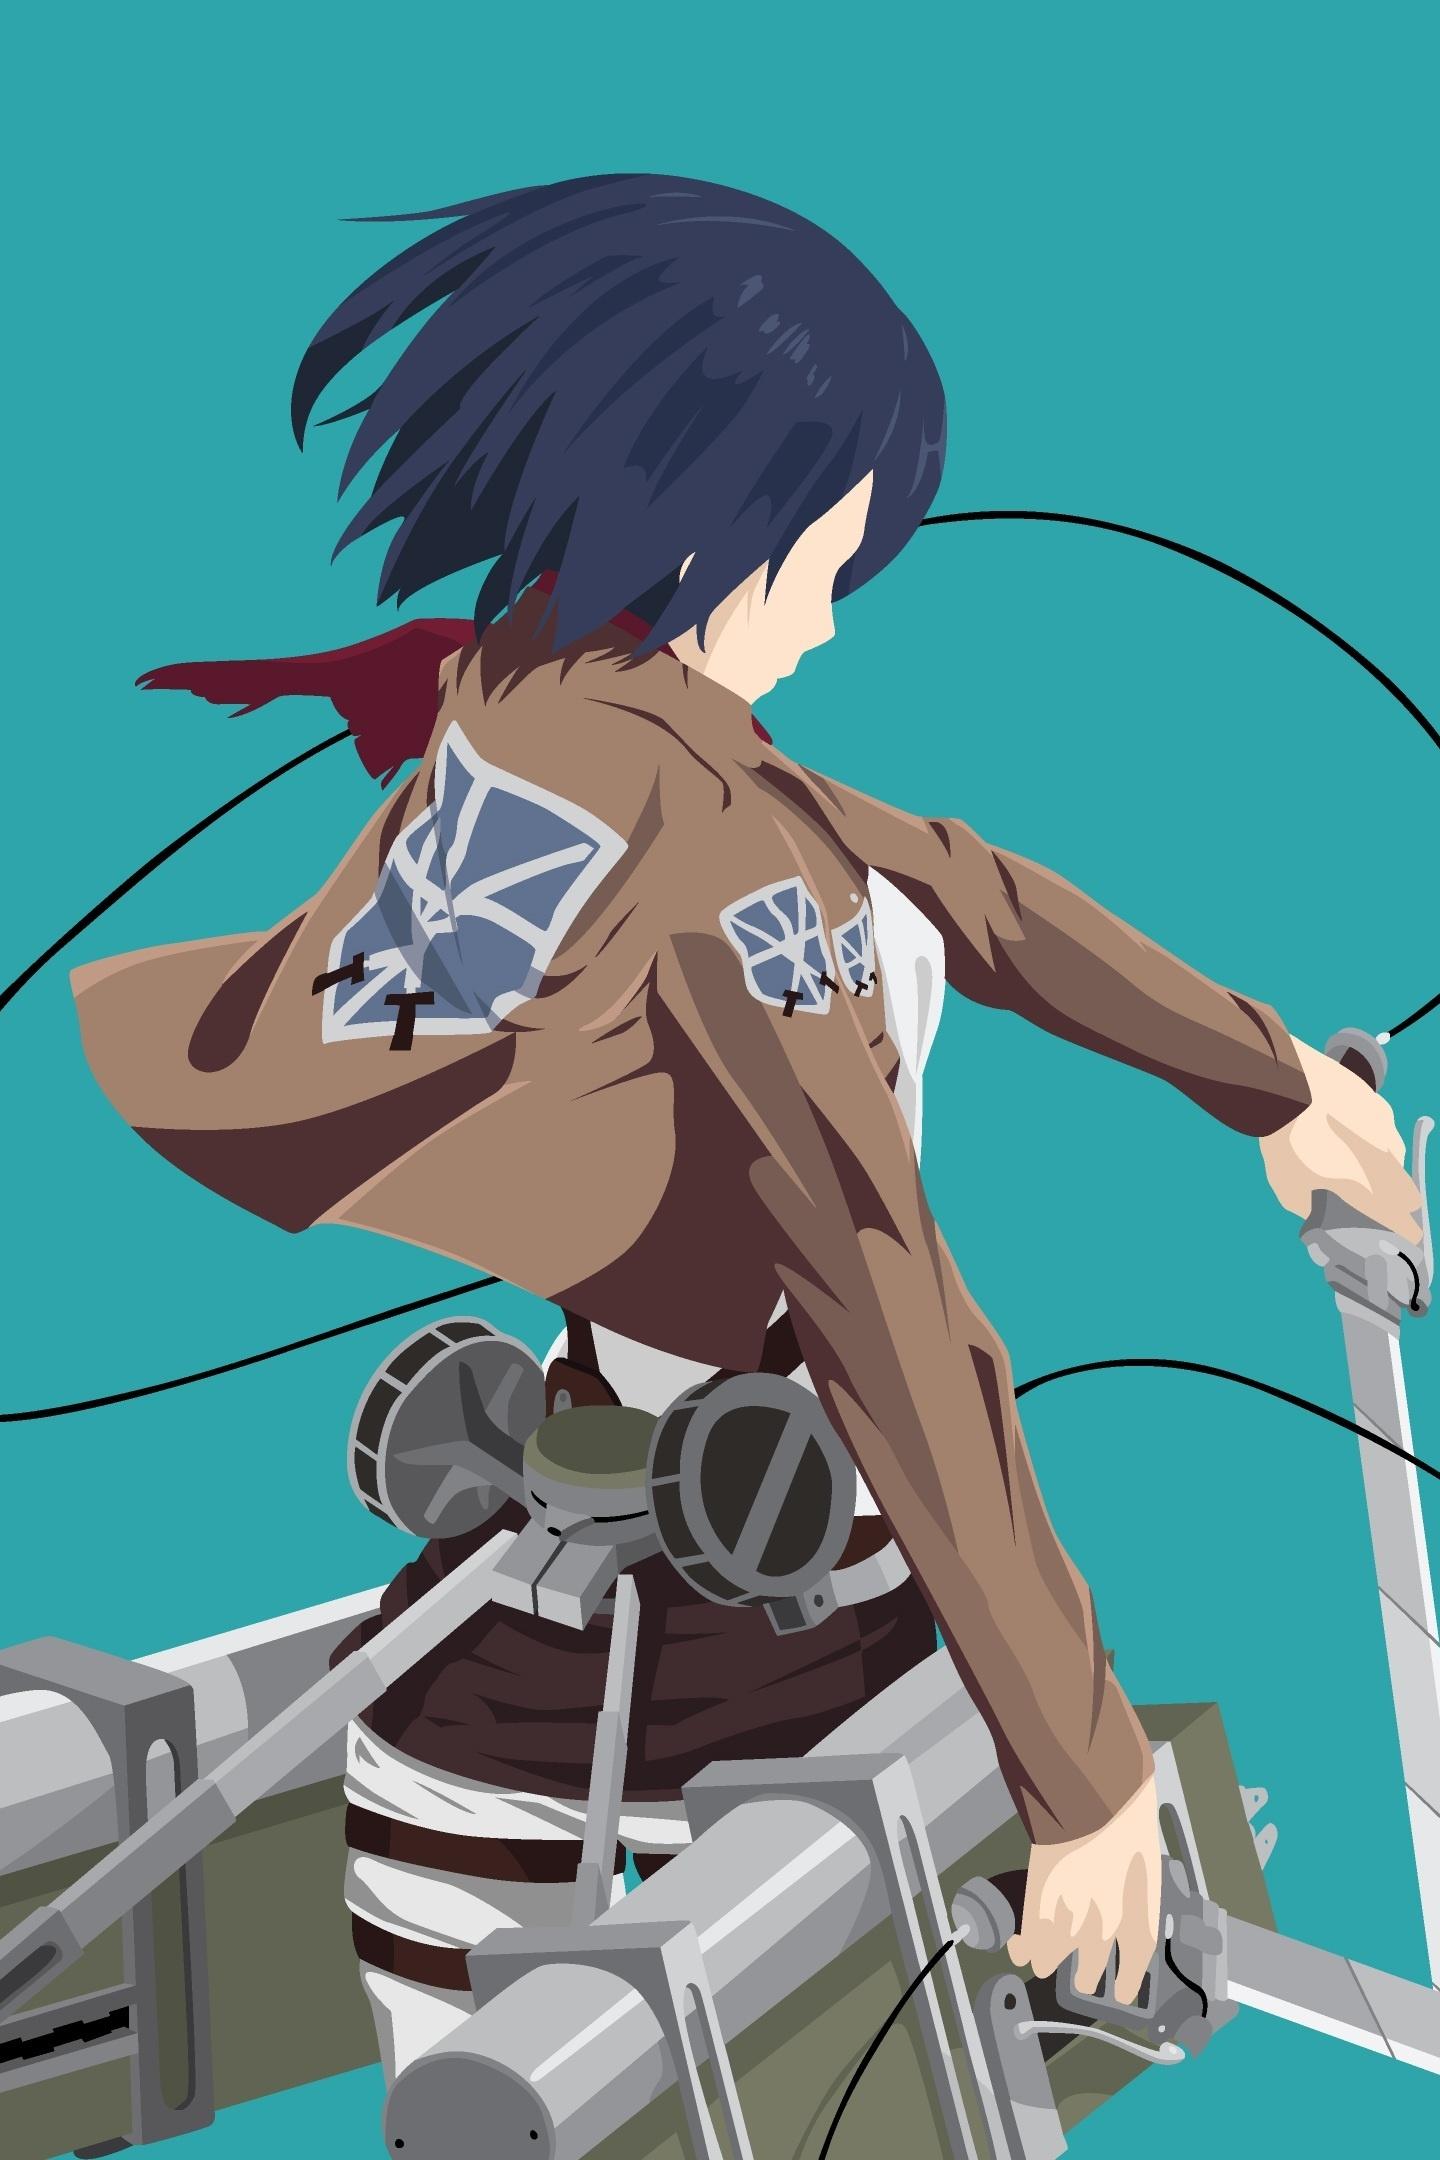 Download 1440x2880 Wallpaper Anime Girl Mikasa Ackerman Minimal Lg V30 Lg G6 1440x2880 Hd Image Background 4075